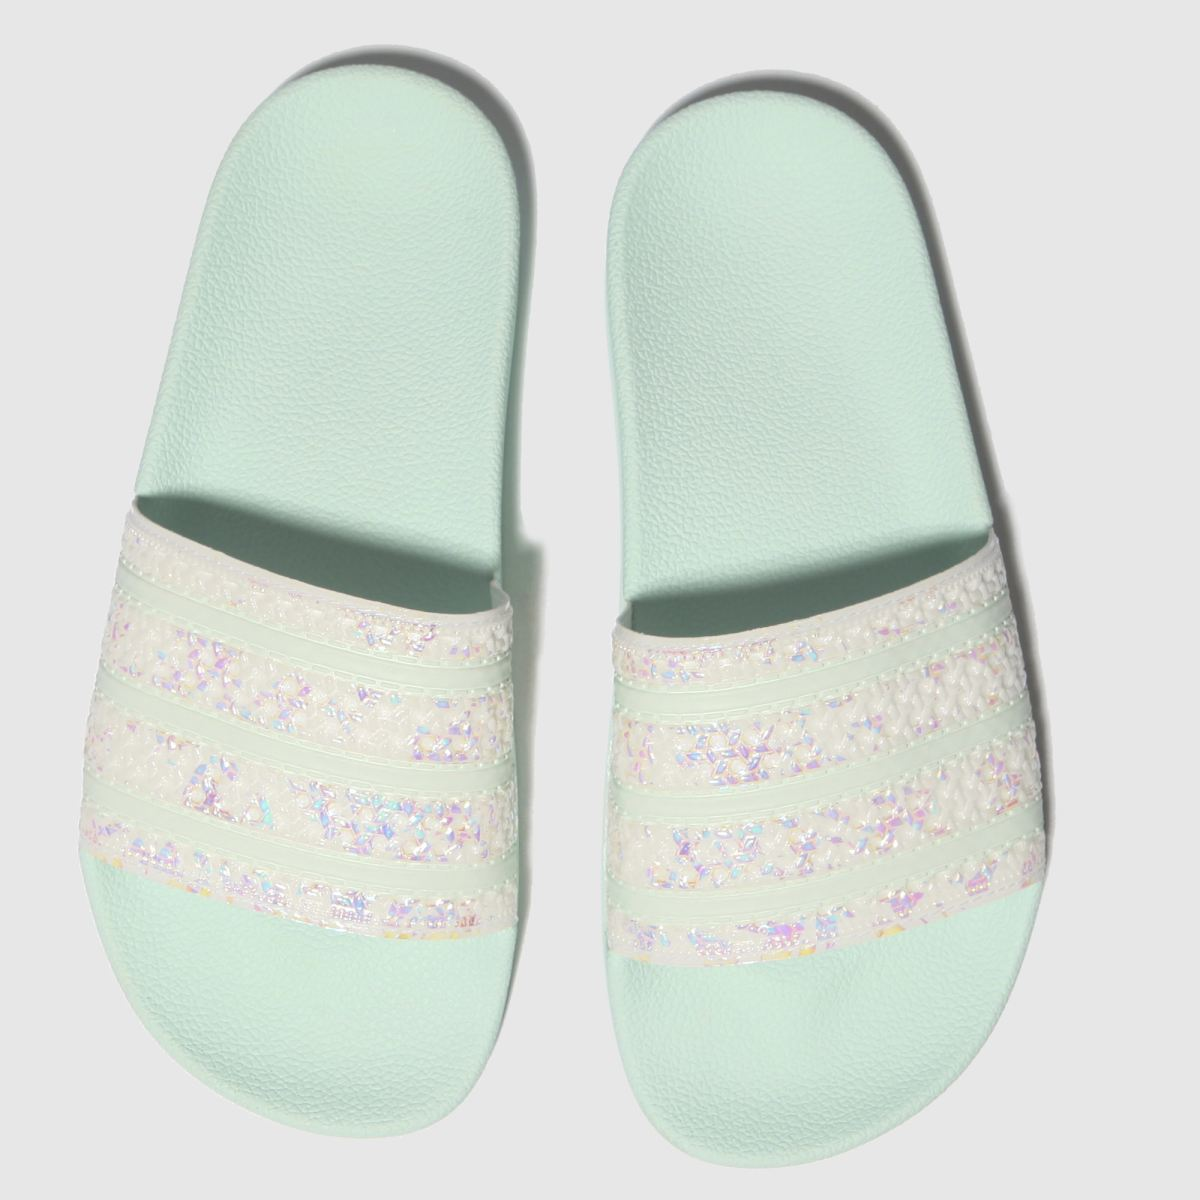 Adidas White & Pl Blue Adilette Sandals